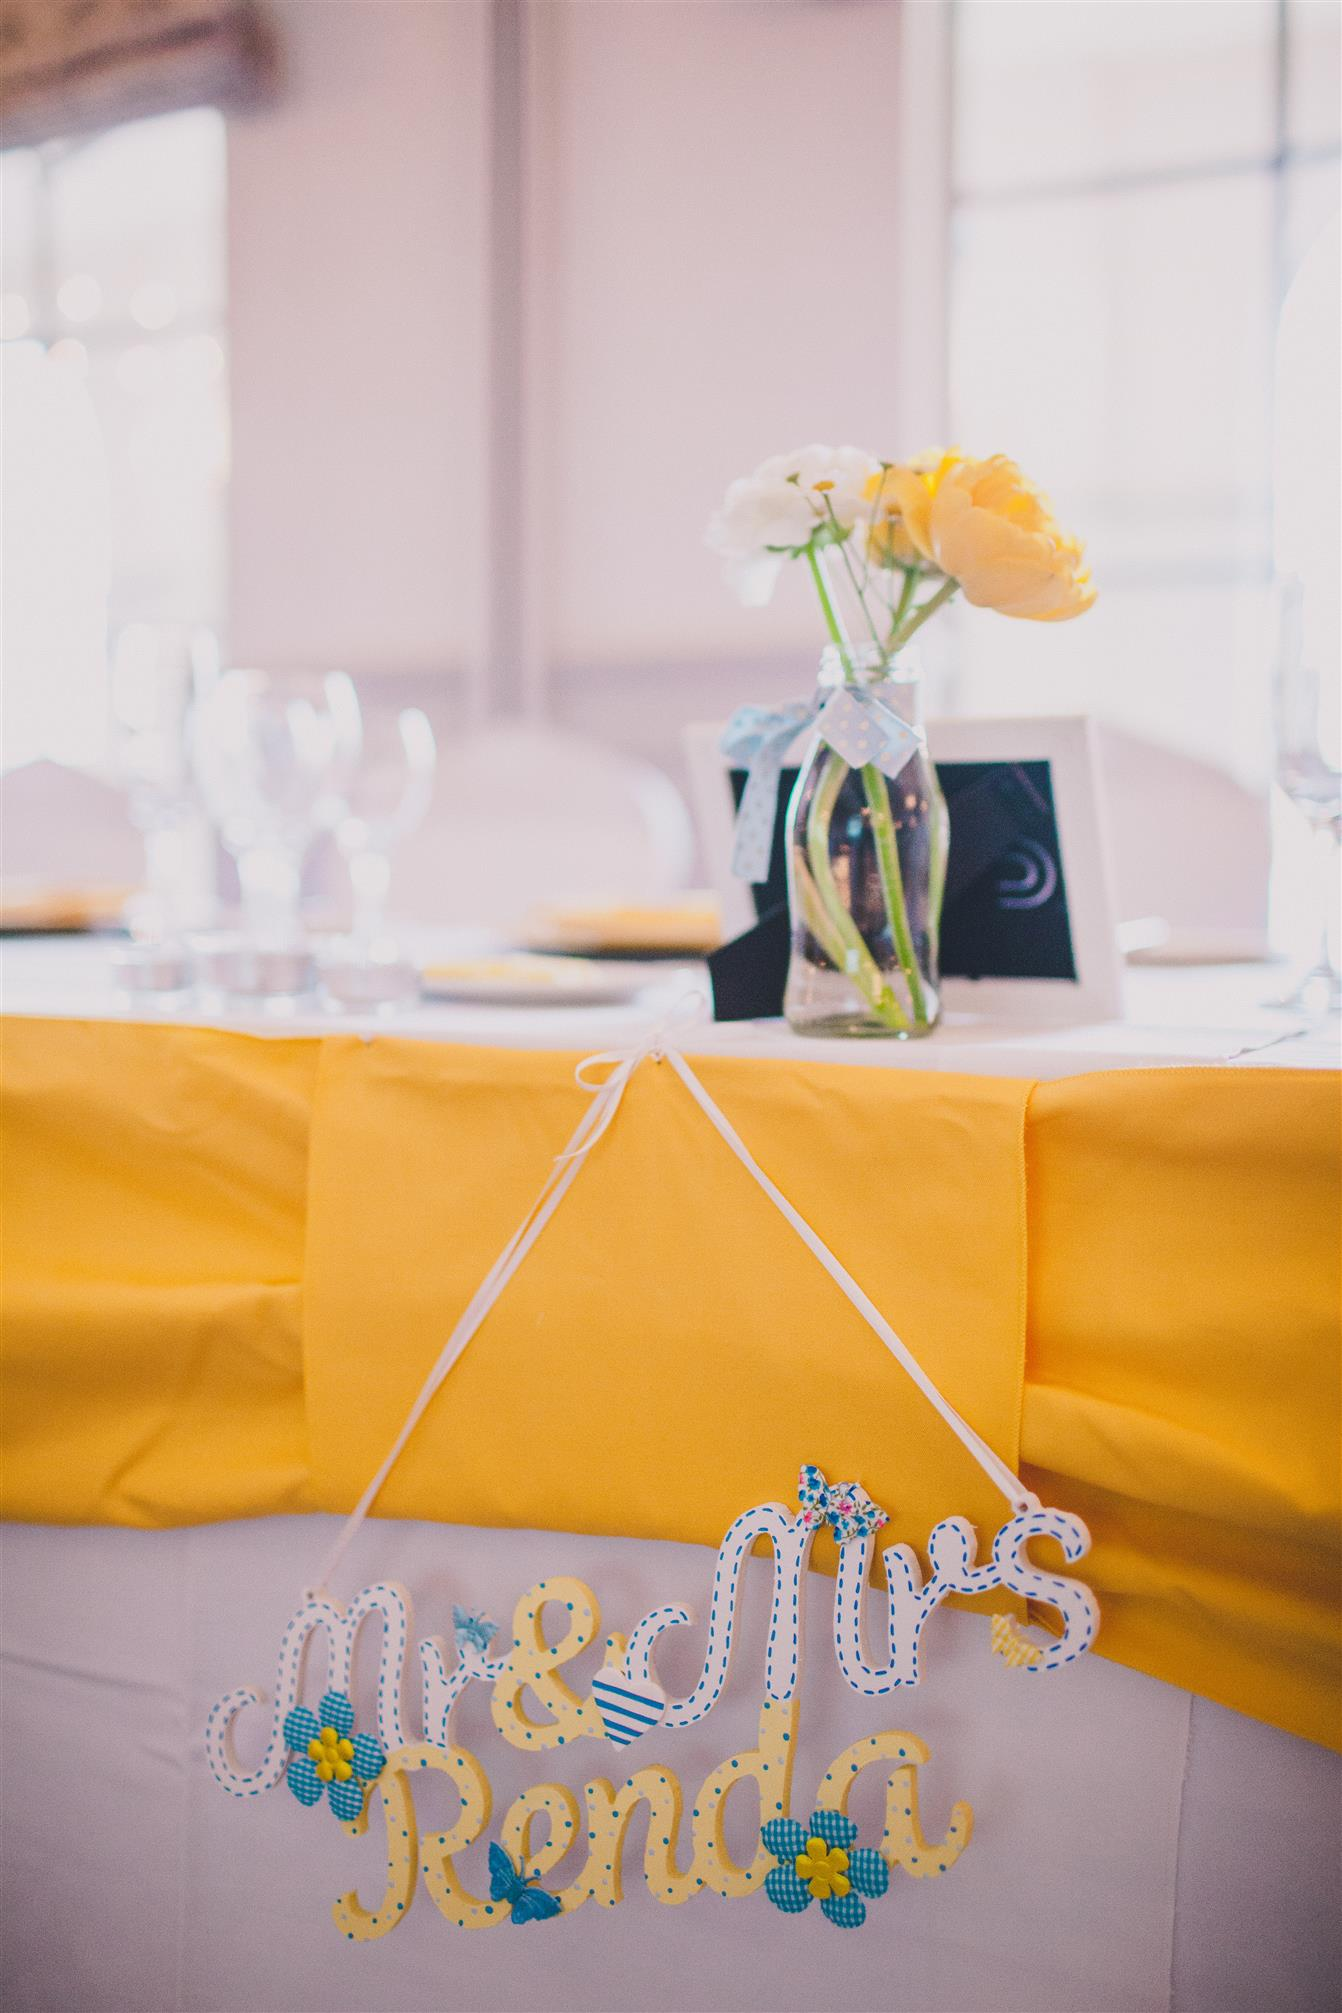 Reception Decror - A Spring 1960s Inspired Wedding